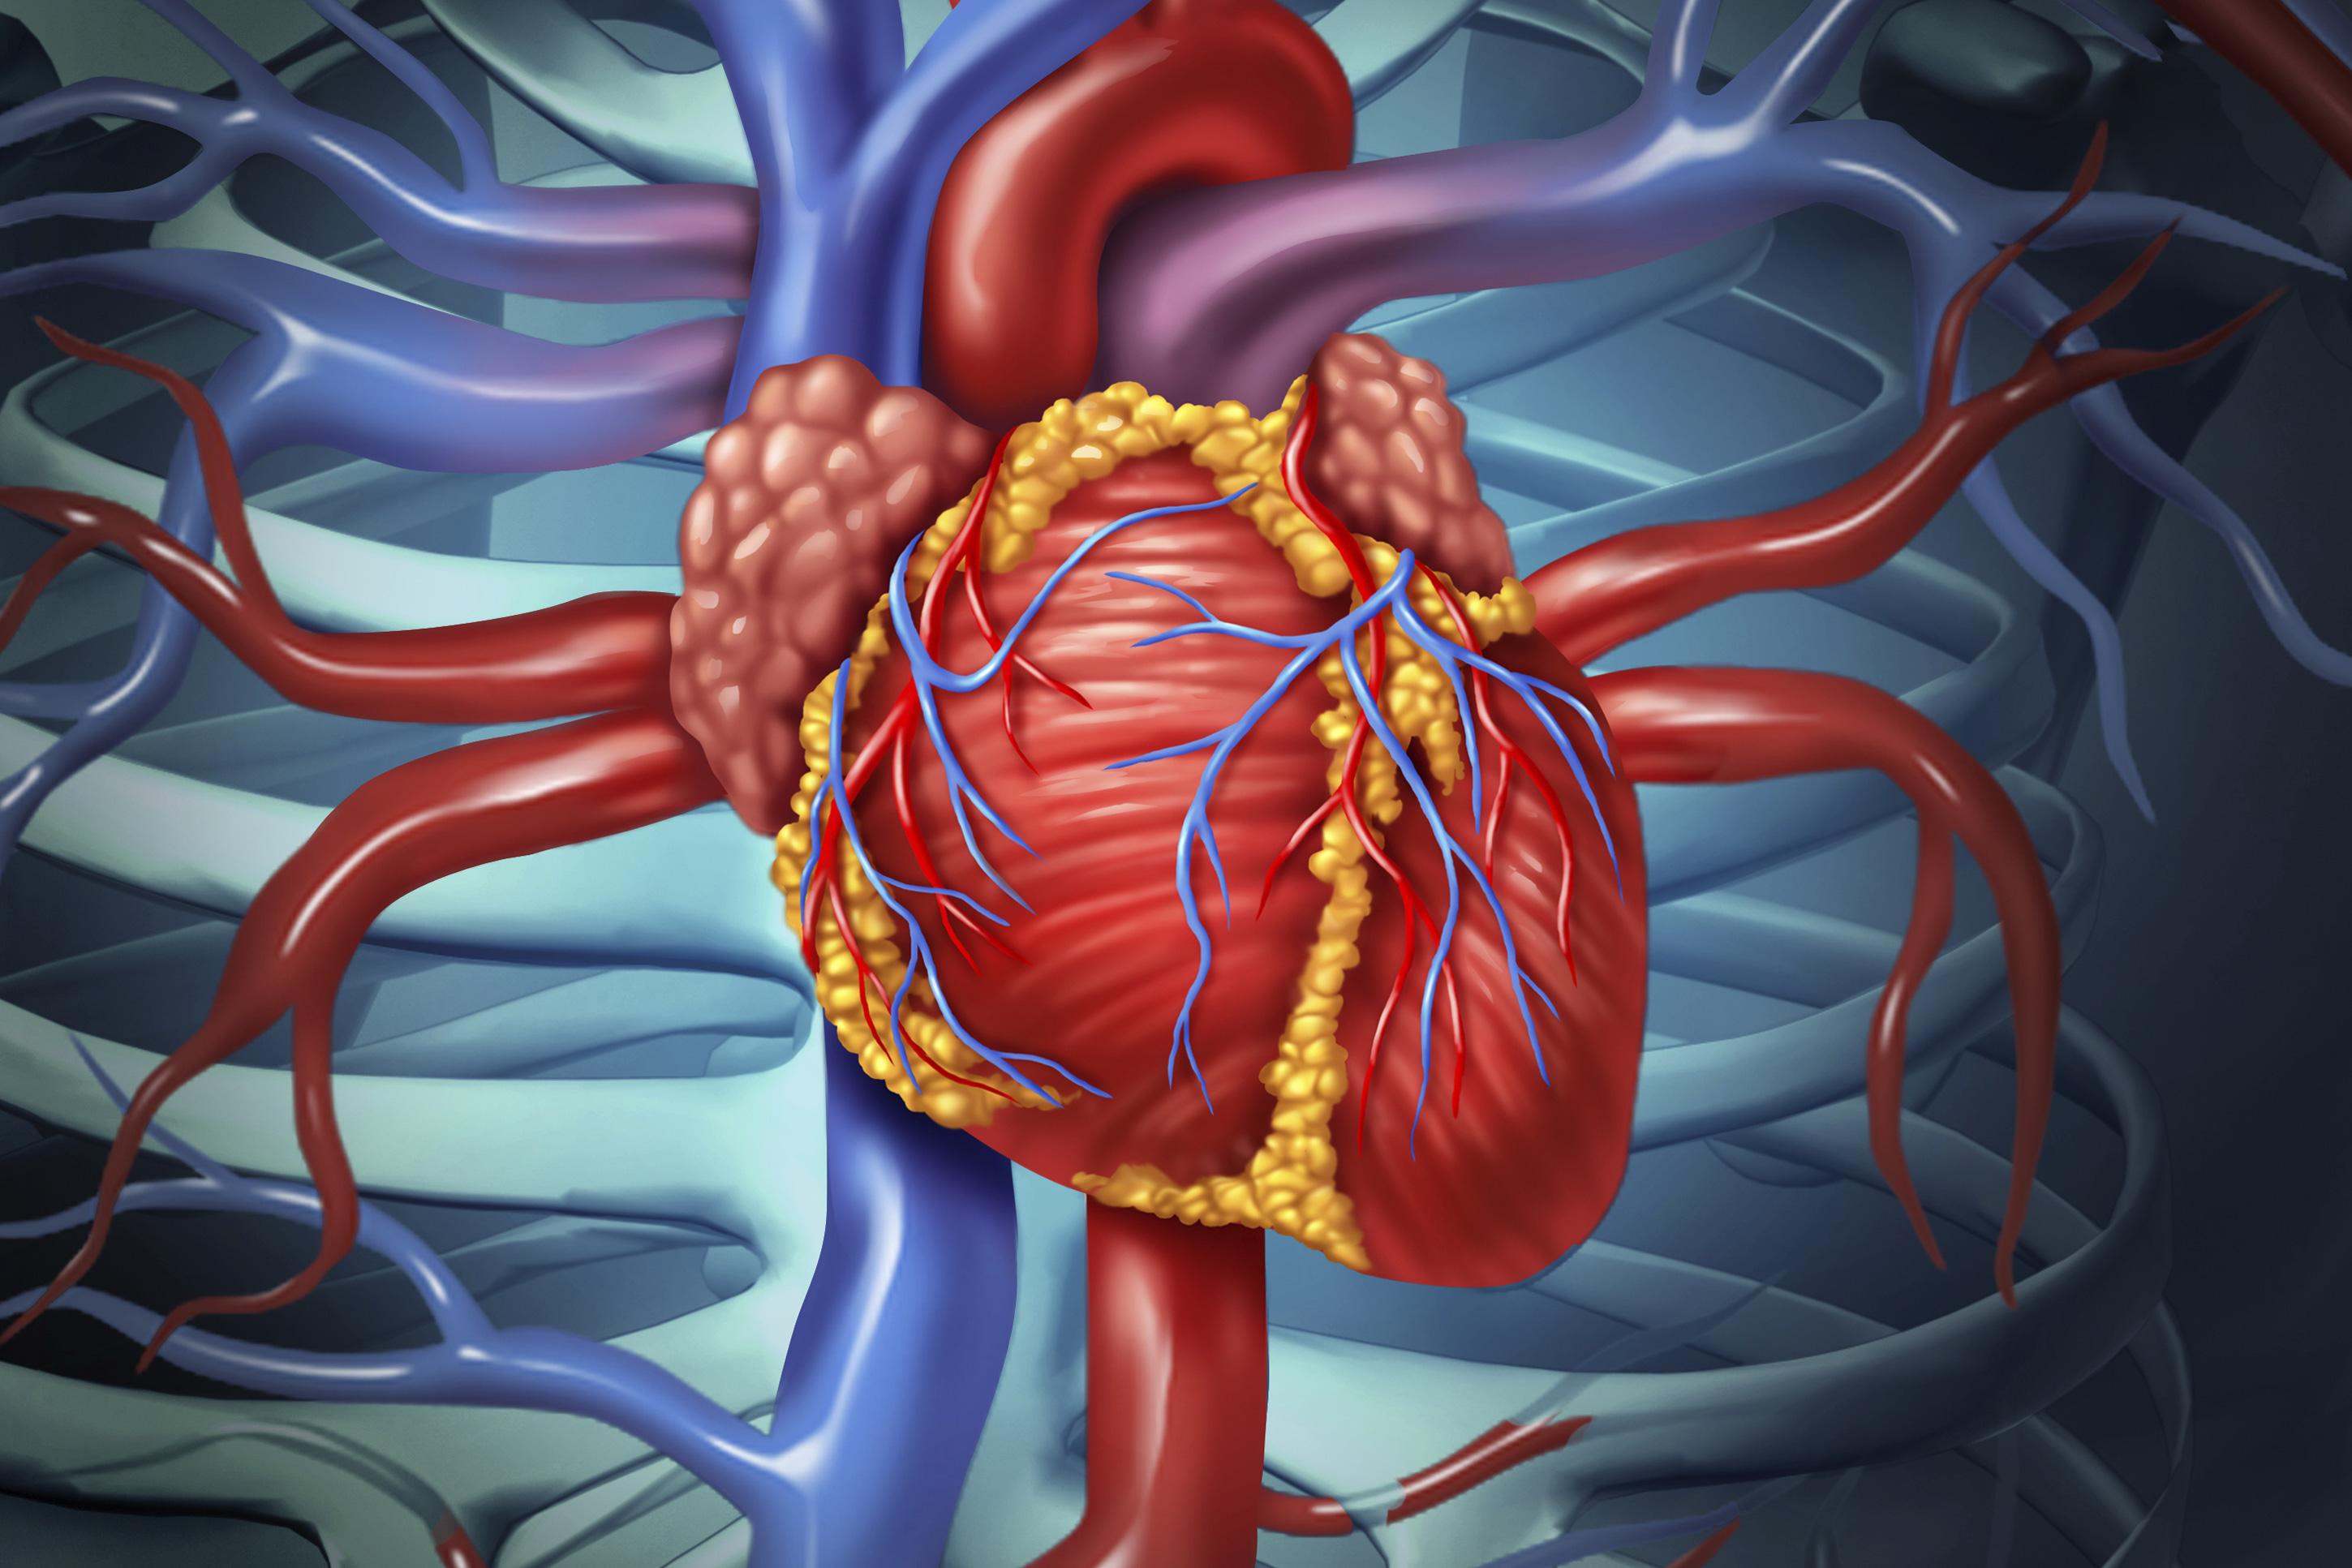 пасха сердце и сердечно сосудистая система картинки представьте